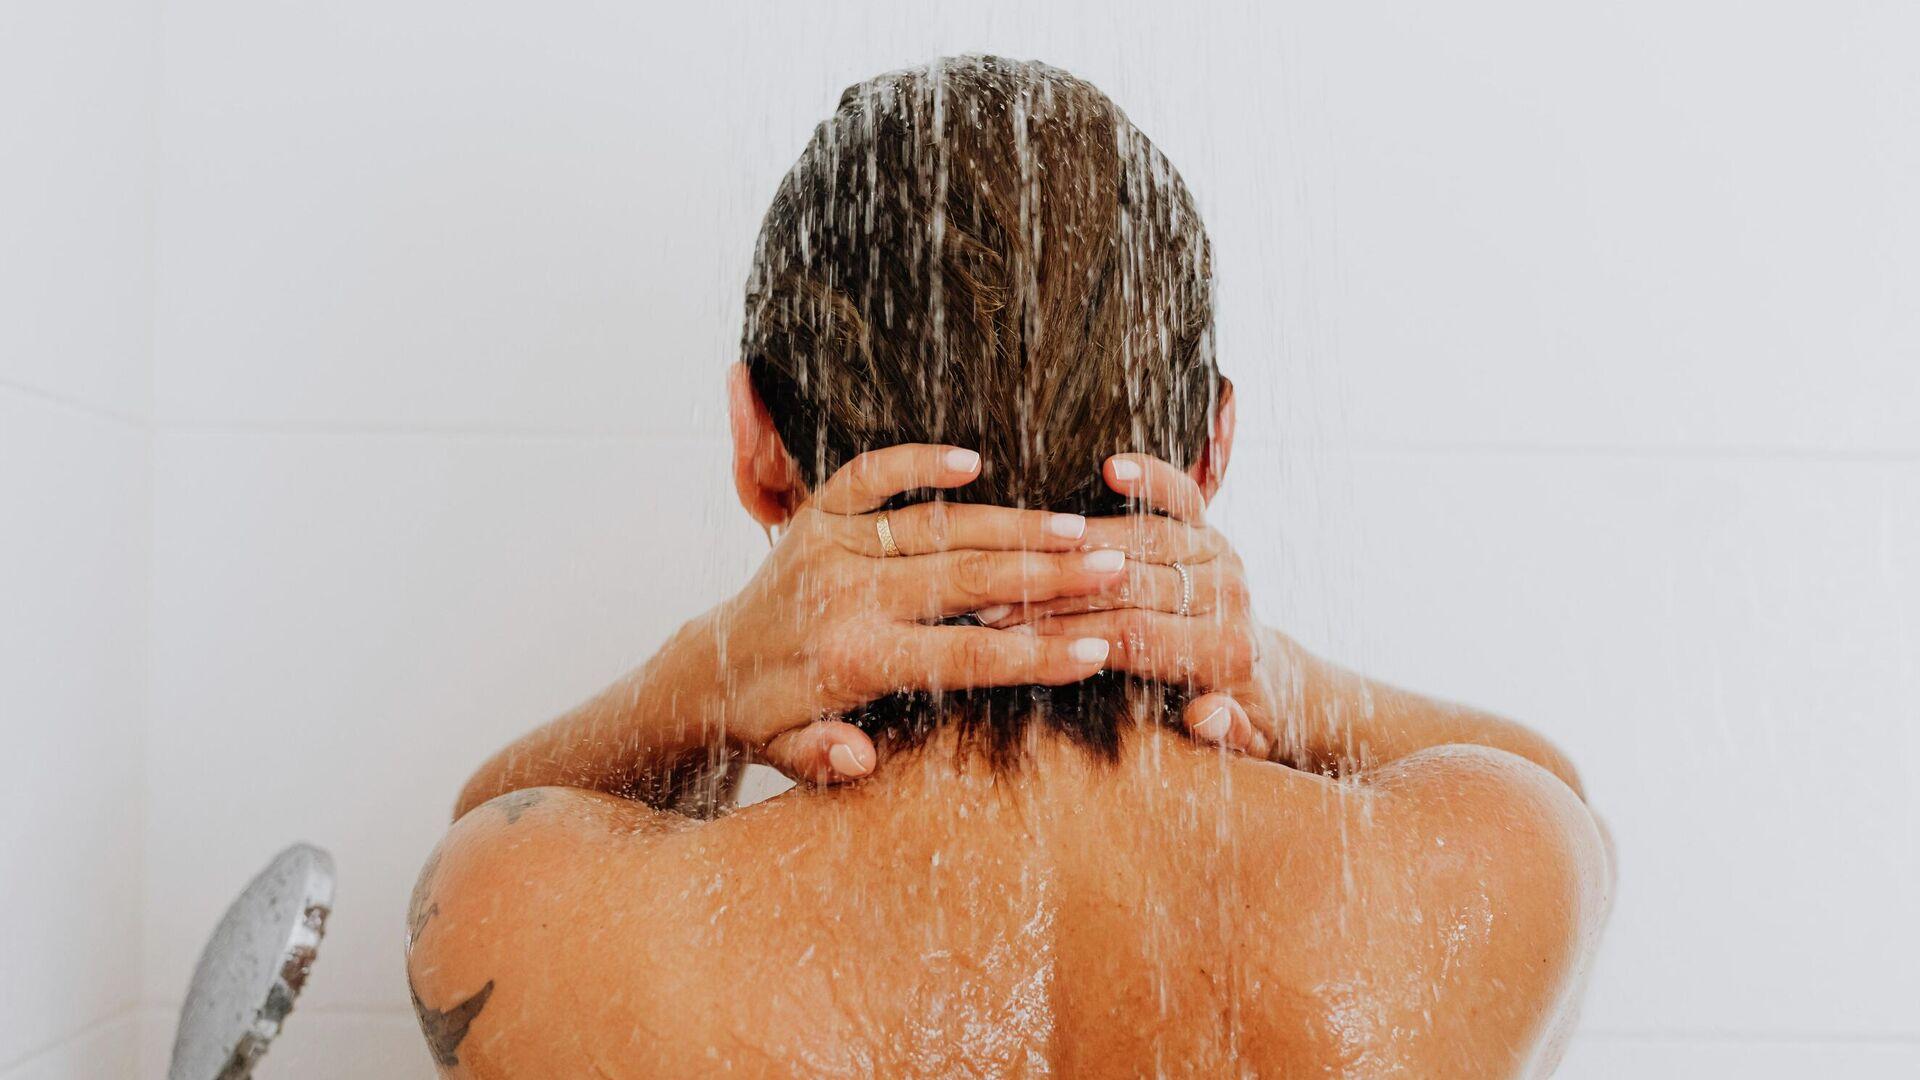 Una persona tomando una ducha - Sputnik Mundo, 1920, 19.09.2021